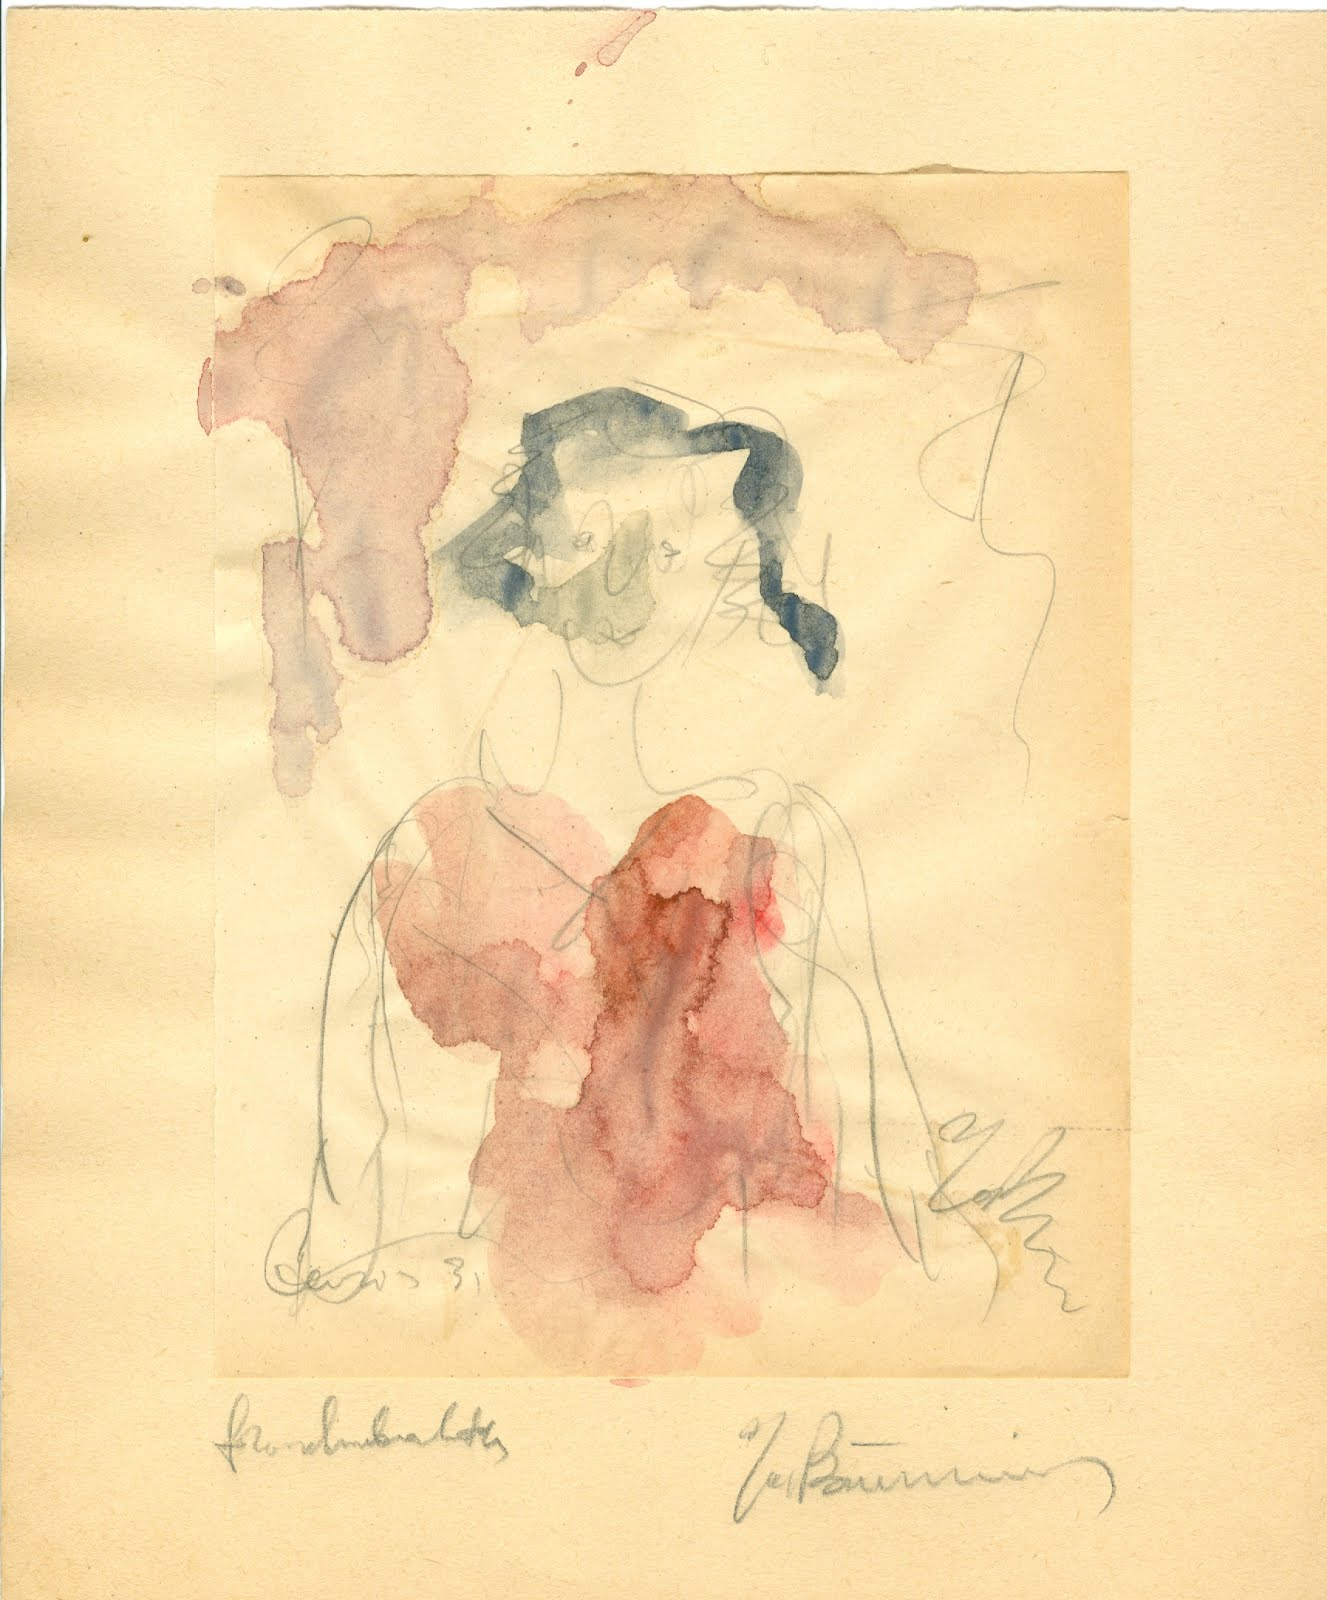 Bouzianis Giorgos Γιώργος Μπουζιάνης (1885-1959) George Bouzianis